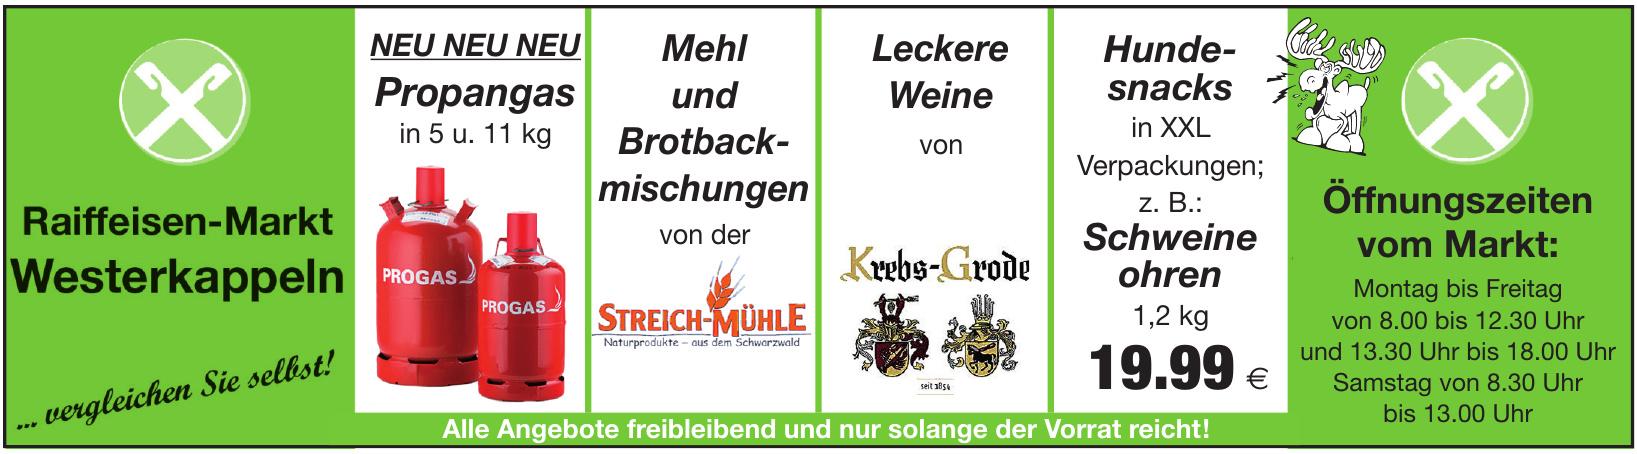 Raiffeisen-Markt Westerkappeln